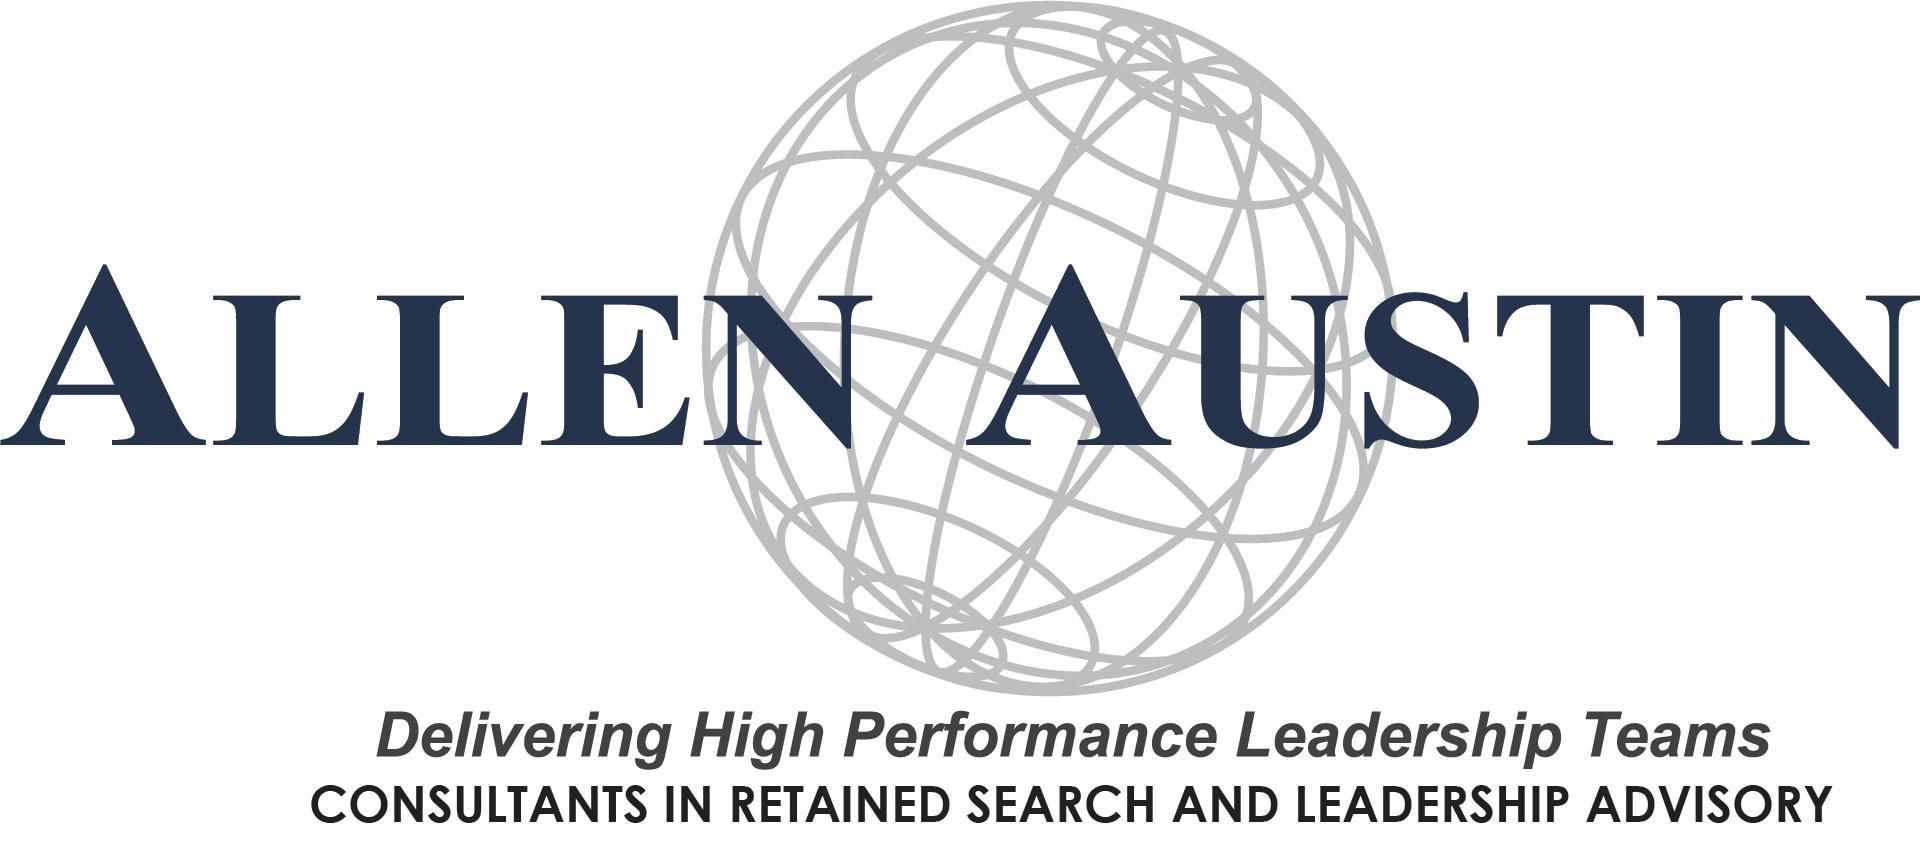 bernhardt logo. Competitor Company Logo Bernhardt T